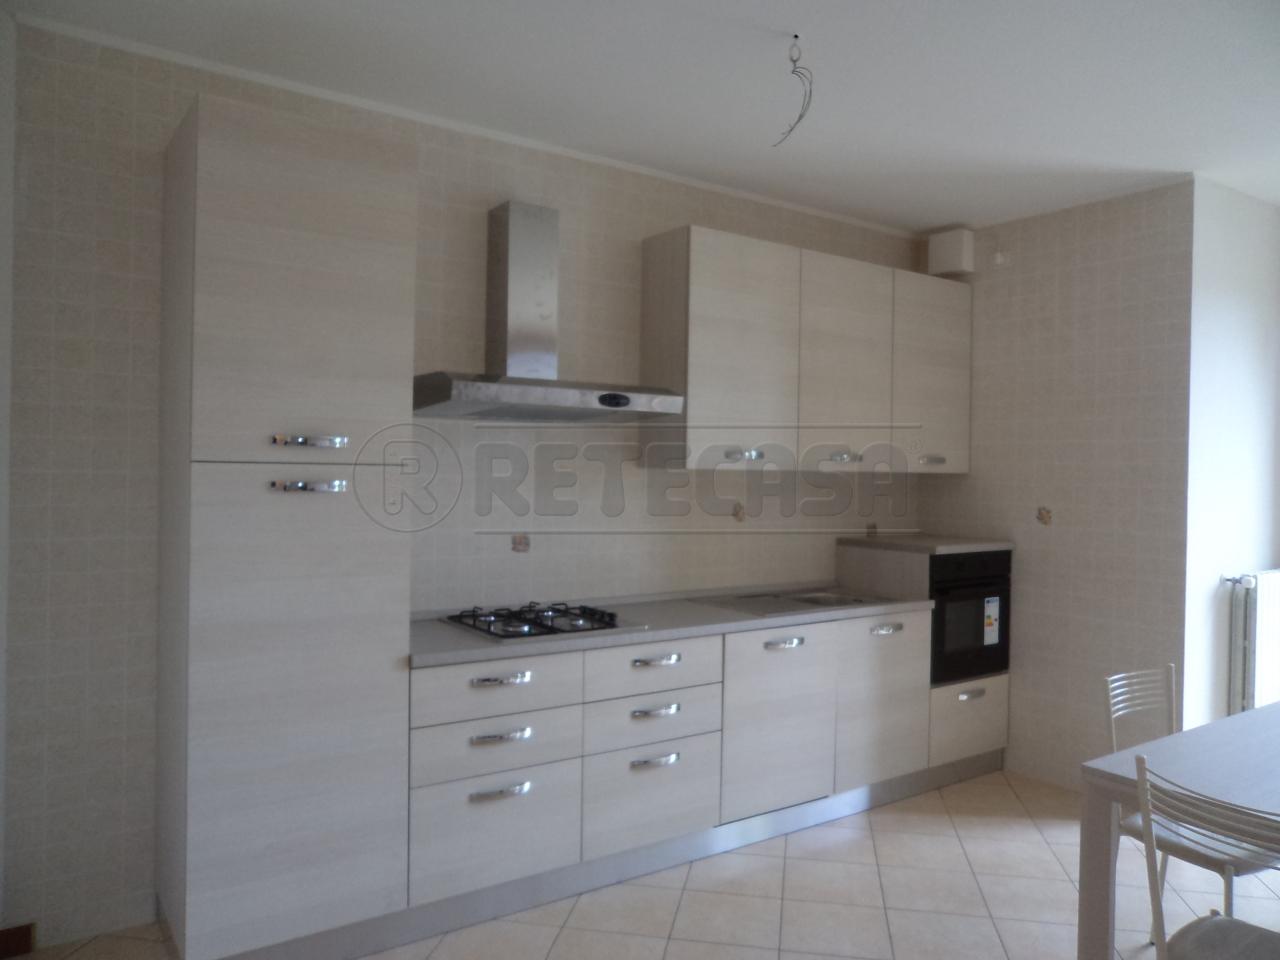 Appartamento - Miniappartamento a CAMPOSAMPIERO, Camposampiero